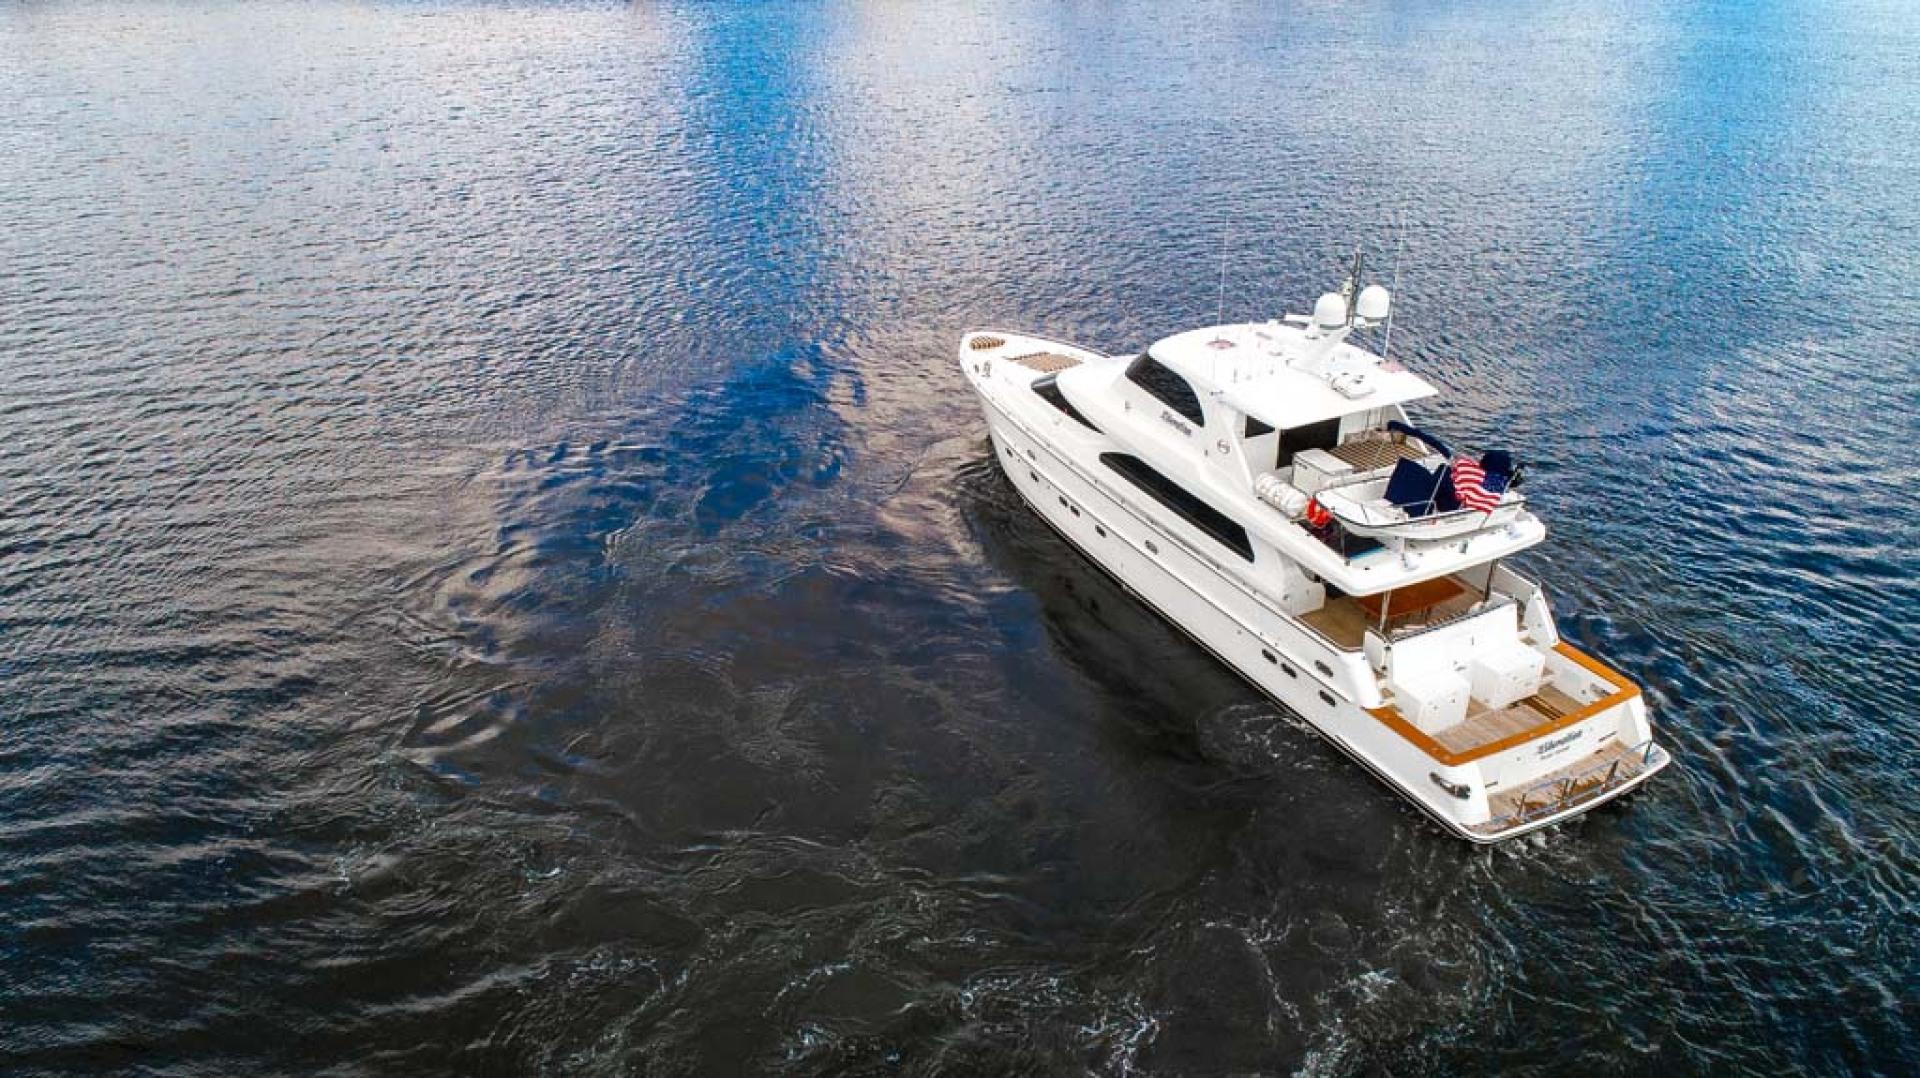 Horizon-Cockpit-Motor-Yacht-2008-Liberation-Stuart-Florida-United-States-Aerial-Port-Aft-View-1075312